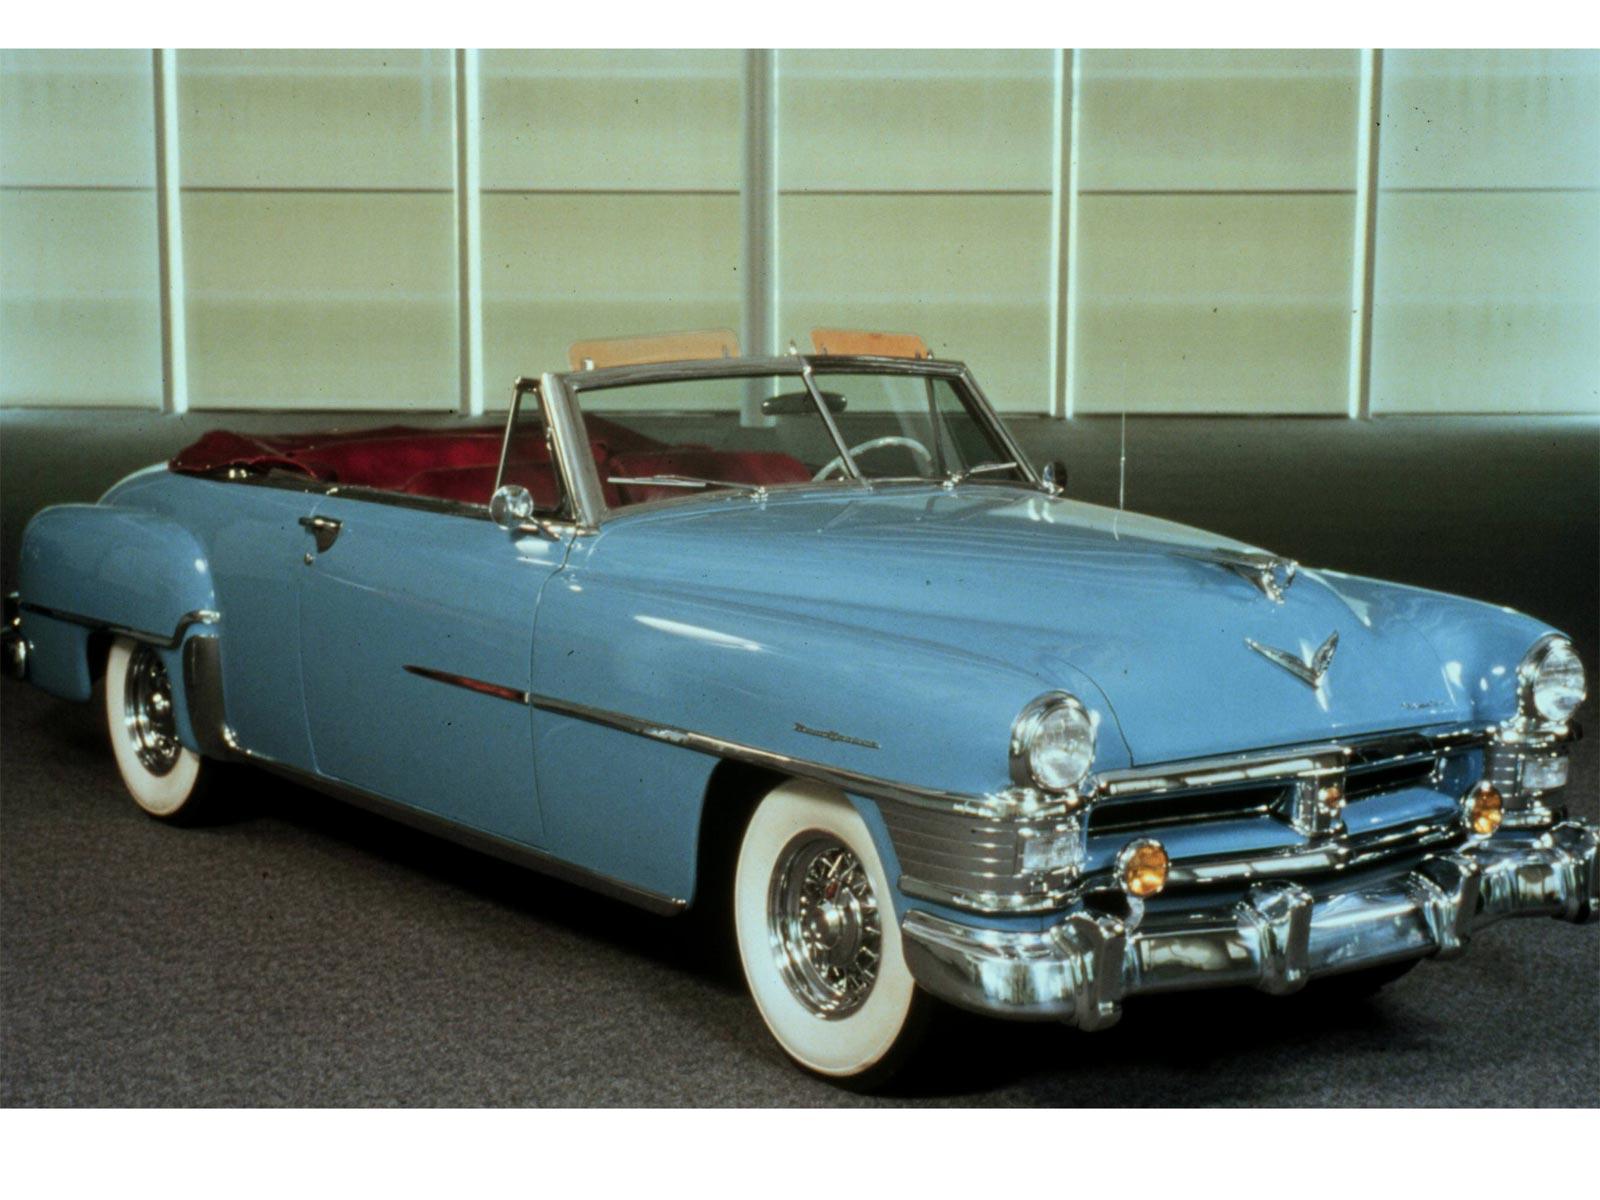 Chrysler 1942 New Yorker Convertible 1949 1954 Cabrio